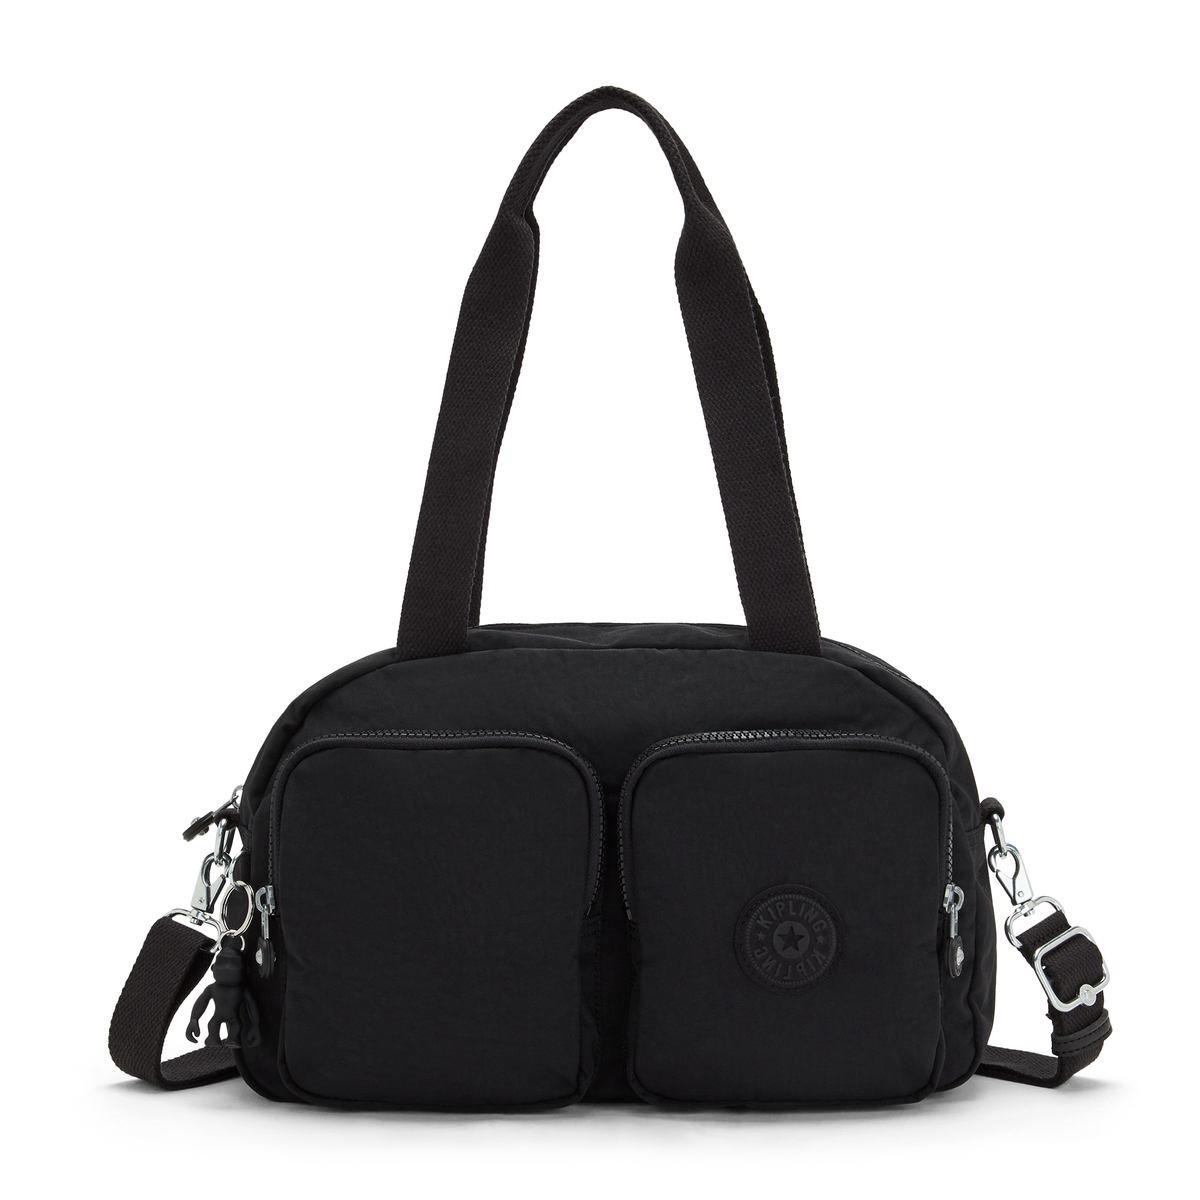 Kipling Τσάντα Ώμου Cool Defea 33x22x12.5cm Black